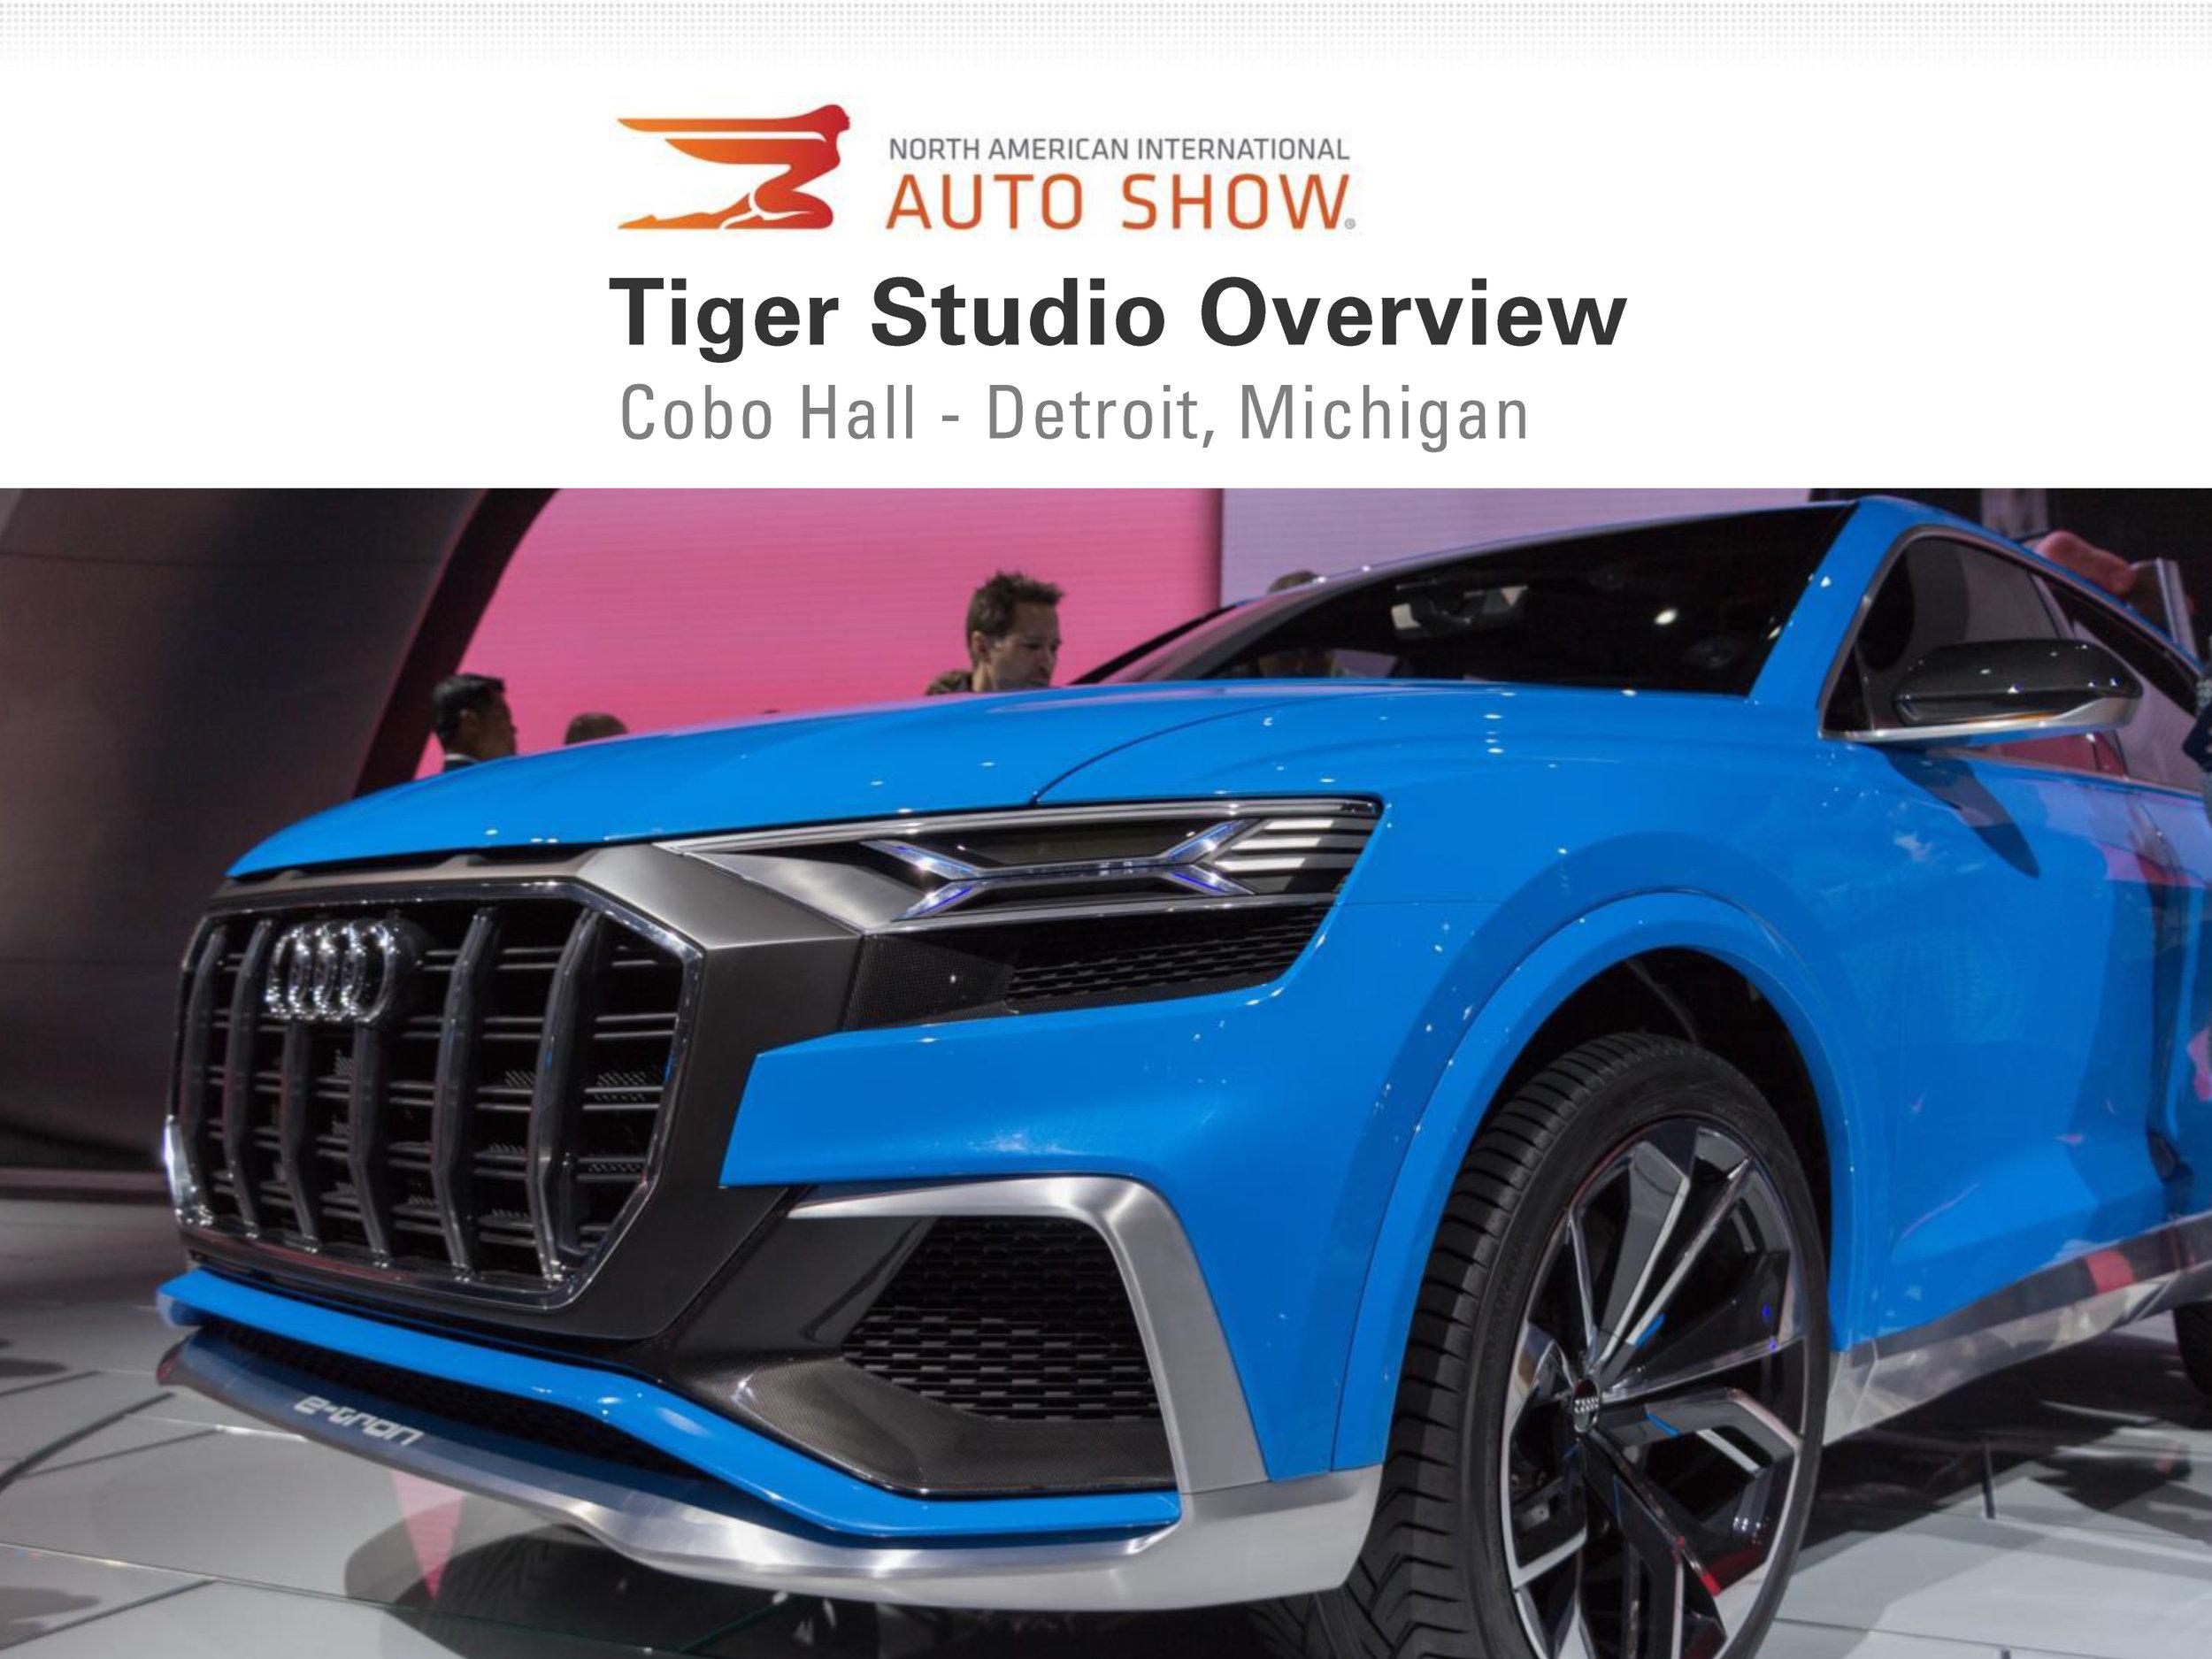 Auto Show 2017, Tiger Studio, 7 Feb (dragged).jpg